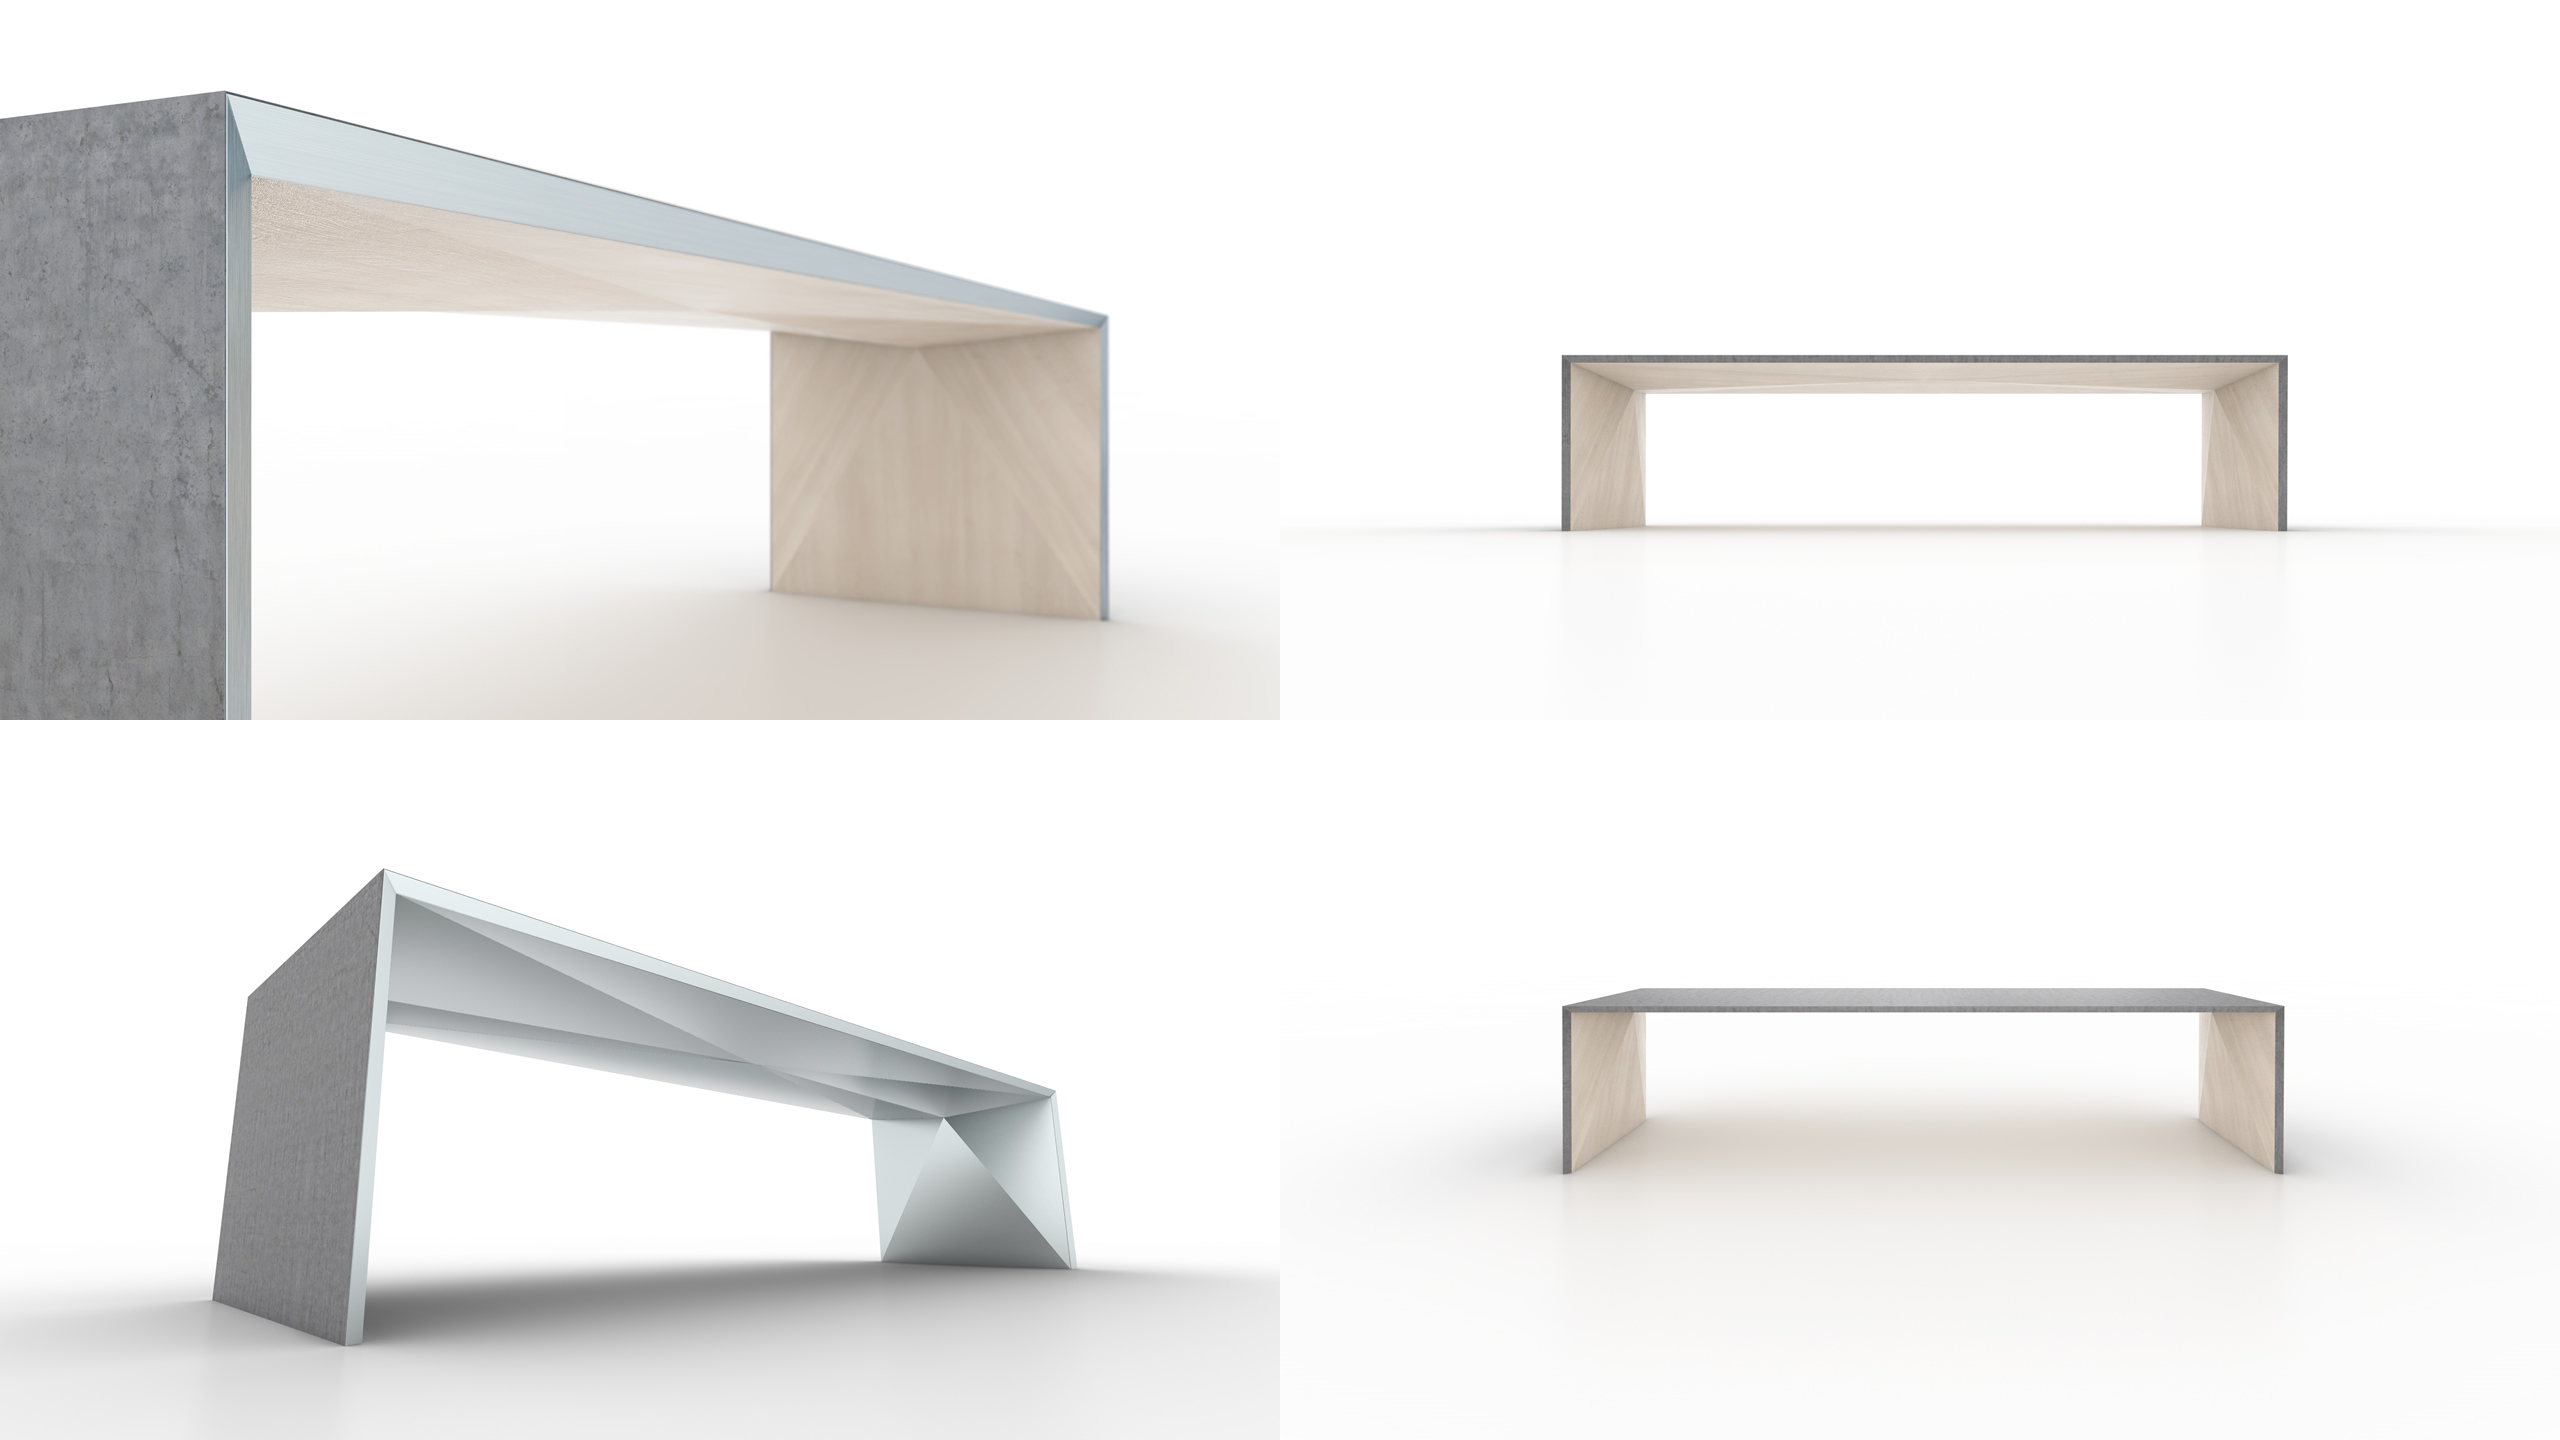 whocares_design_sacac_concretetable_v1_rendering_001